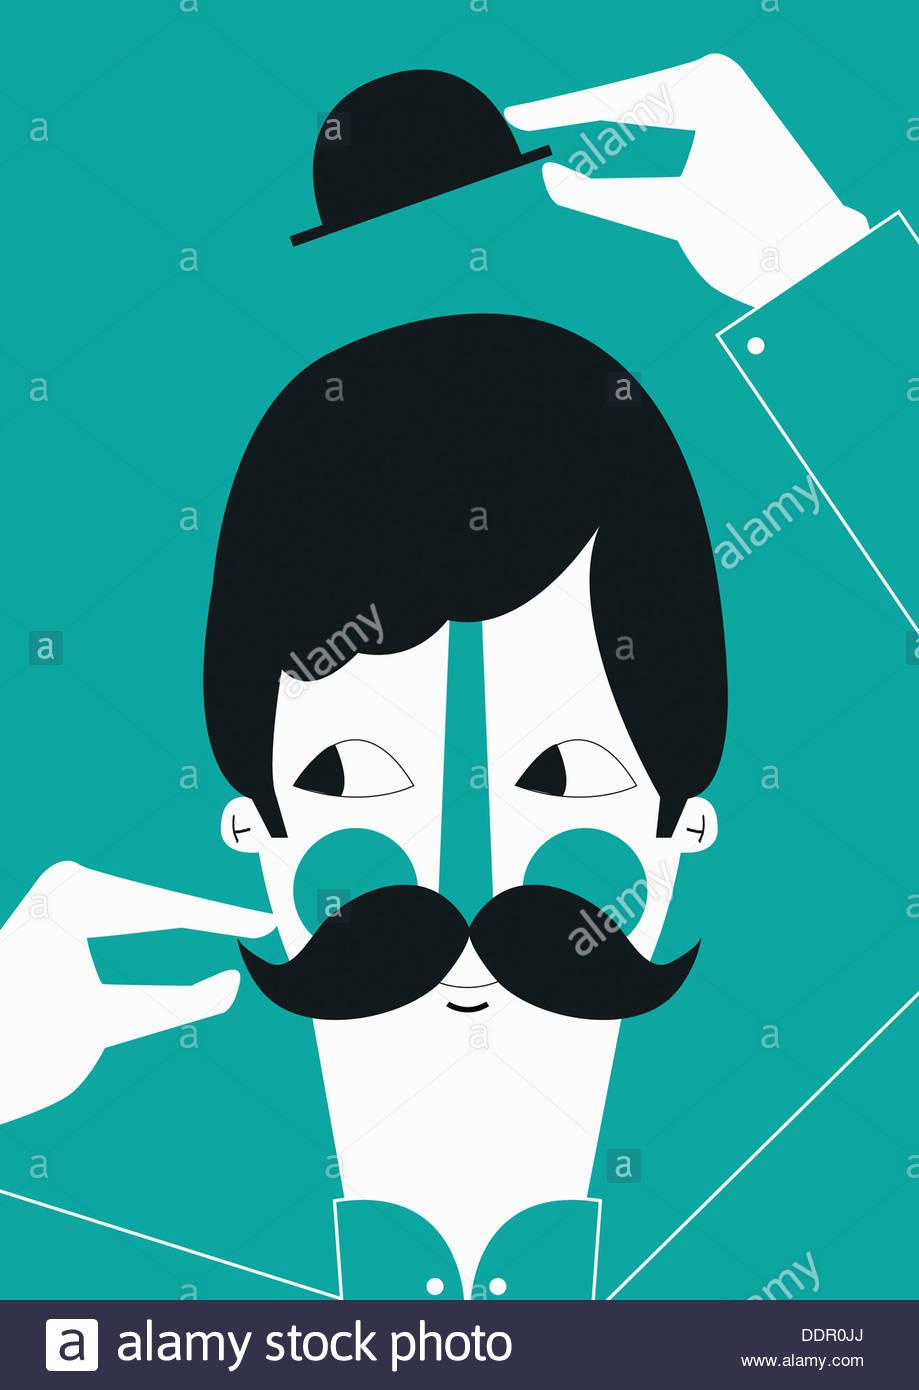 Man raising bowler hat and twisting mustache - Stock Image